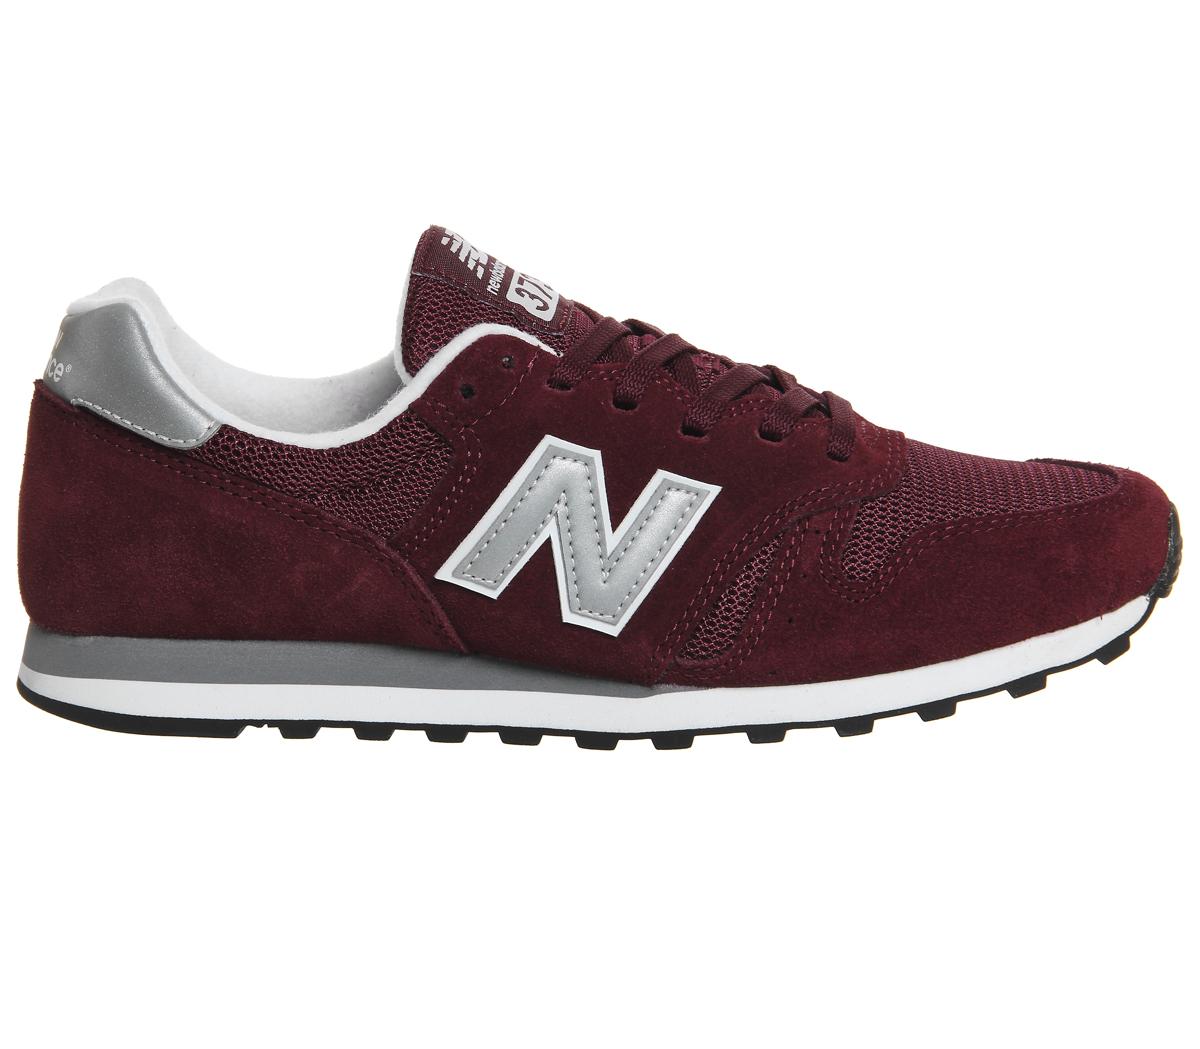 cheaper d636c 1b1ad Homme-New-Balance-373-Bordeaux-Silver-Baskets-Chaussures miniature